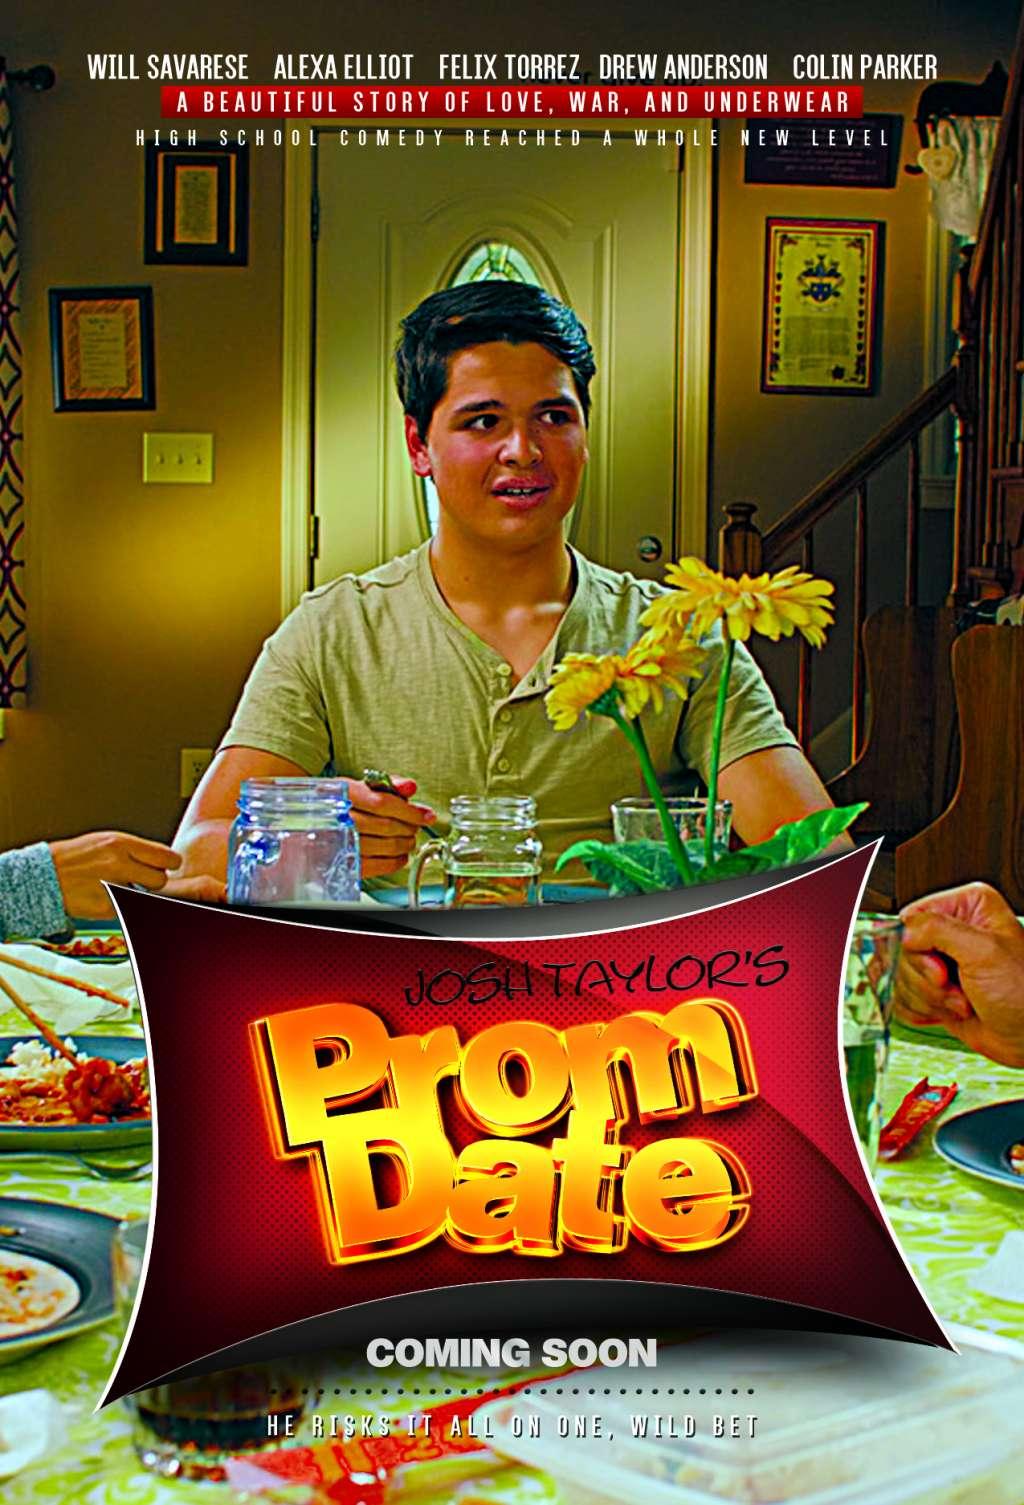 Josh Taylor's Prom Date kapak